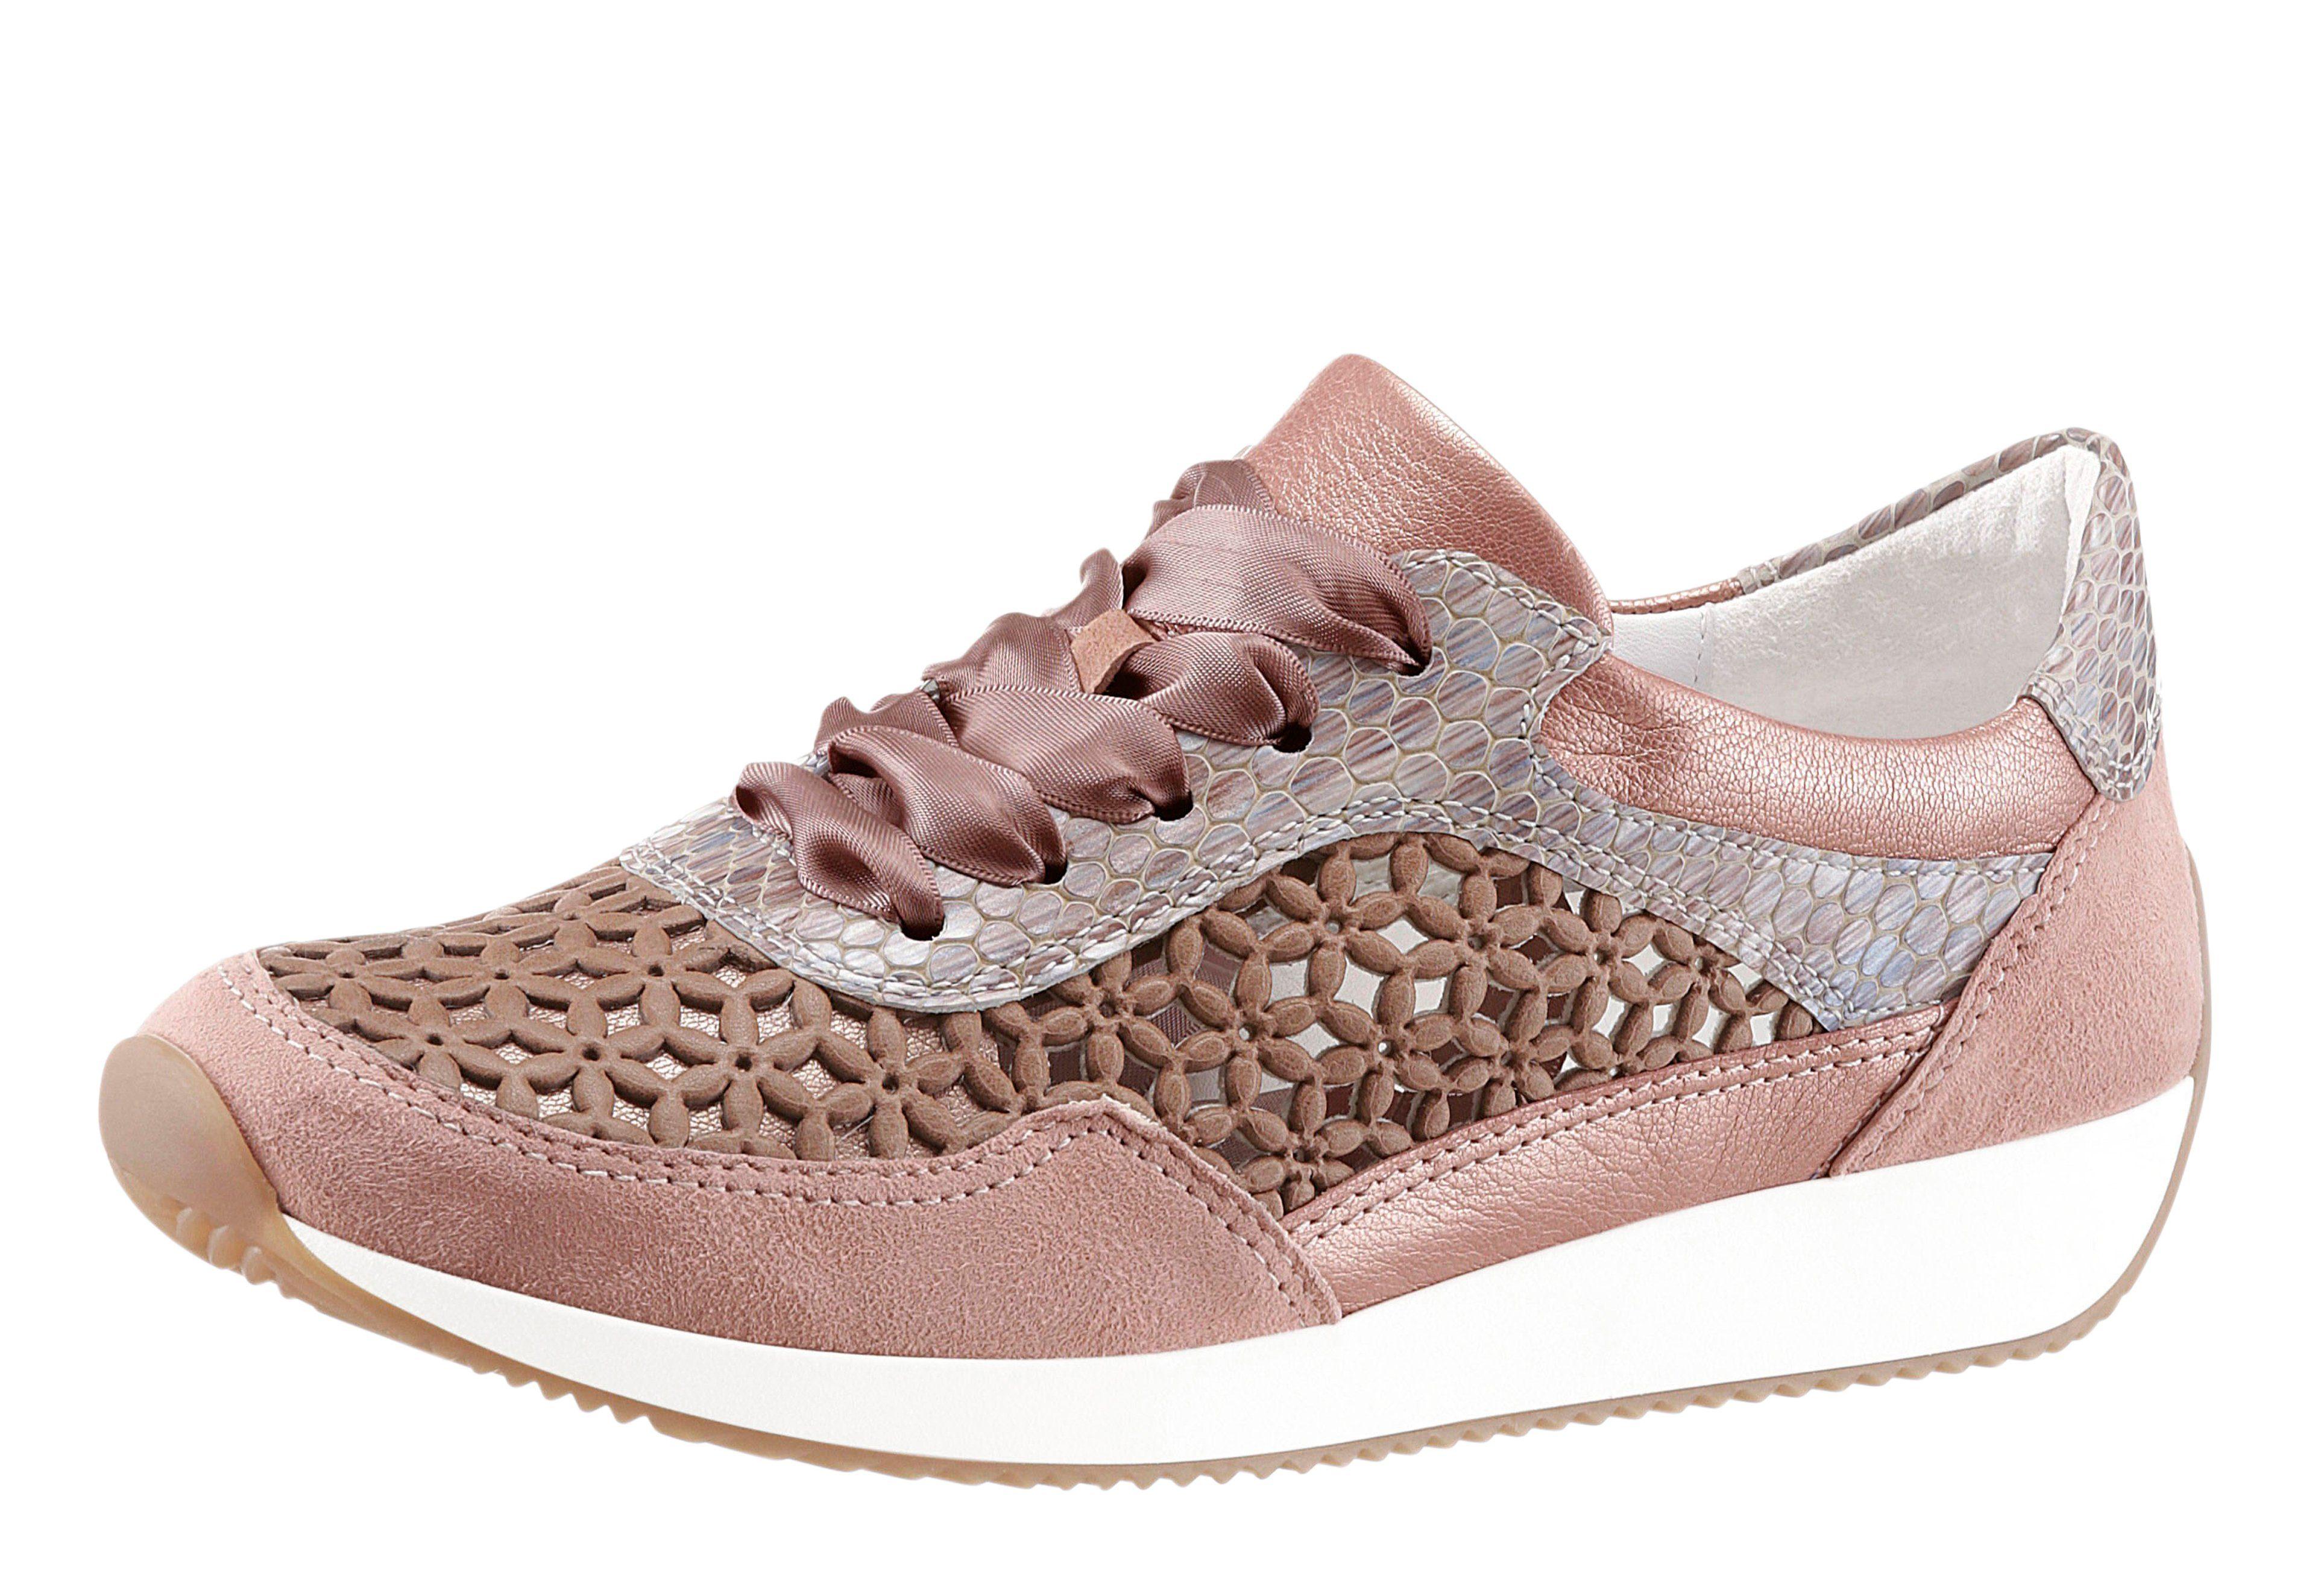 Ara Chaussures En Dentelle Rose aggweGYab